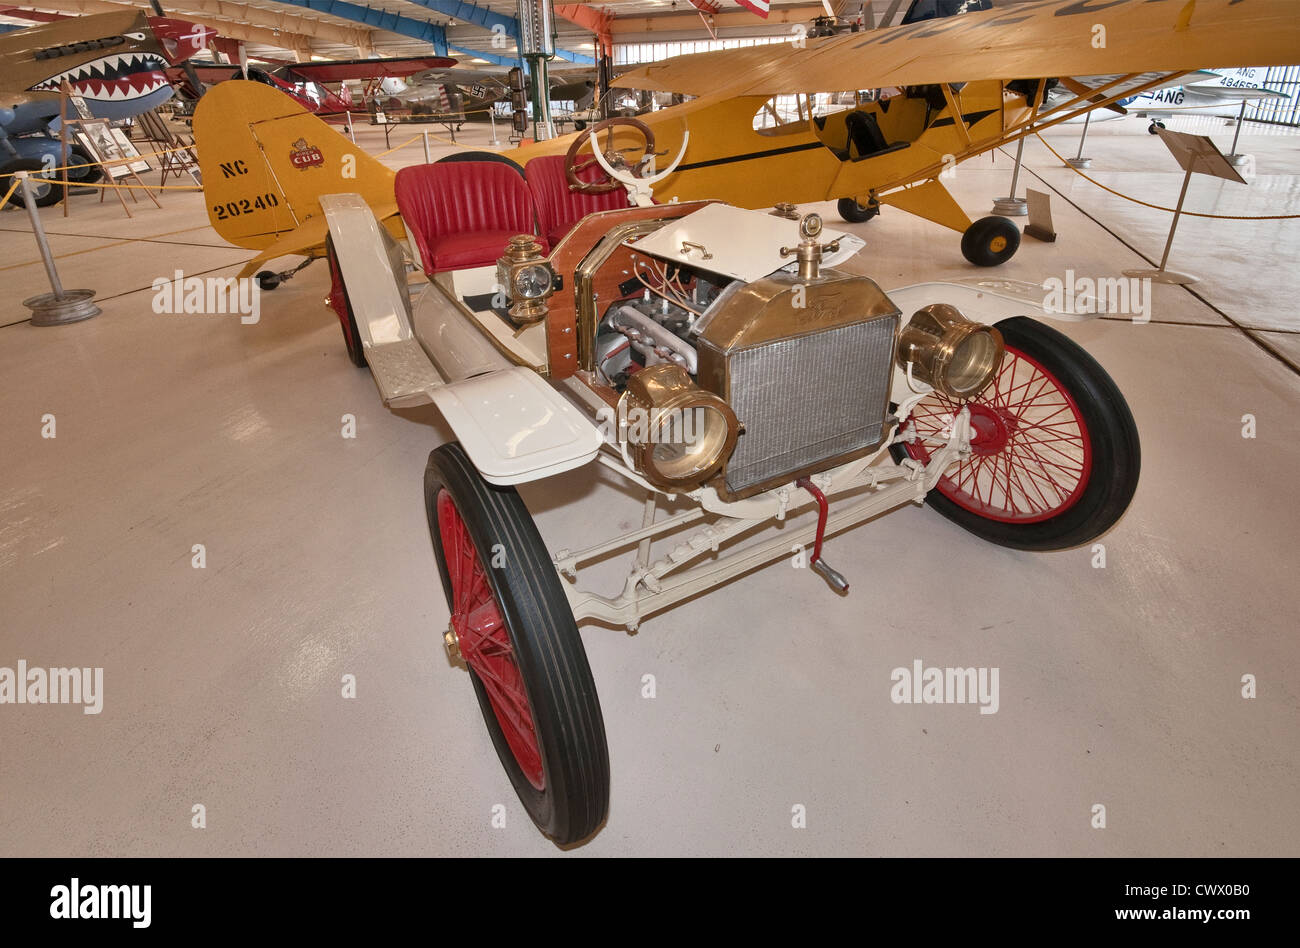 1914 Ford Model T Roadster at War Eagles Air Museum, Santa Teresa, New Mexico, USA - Stock Image